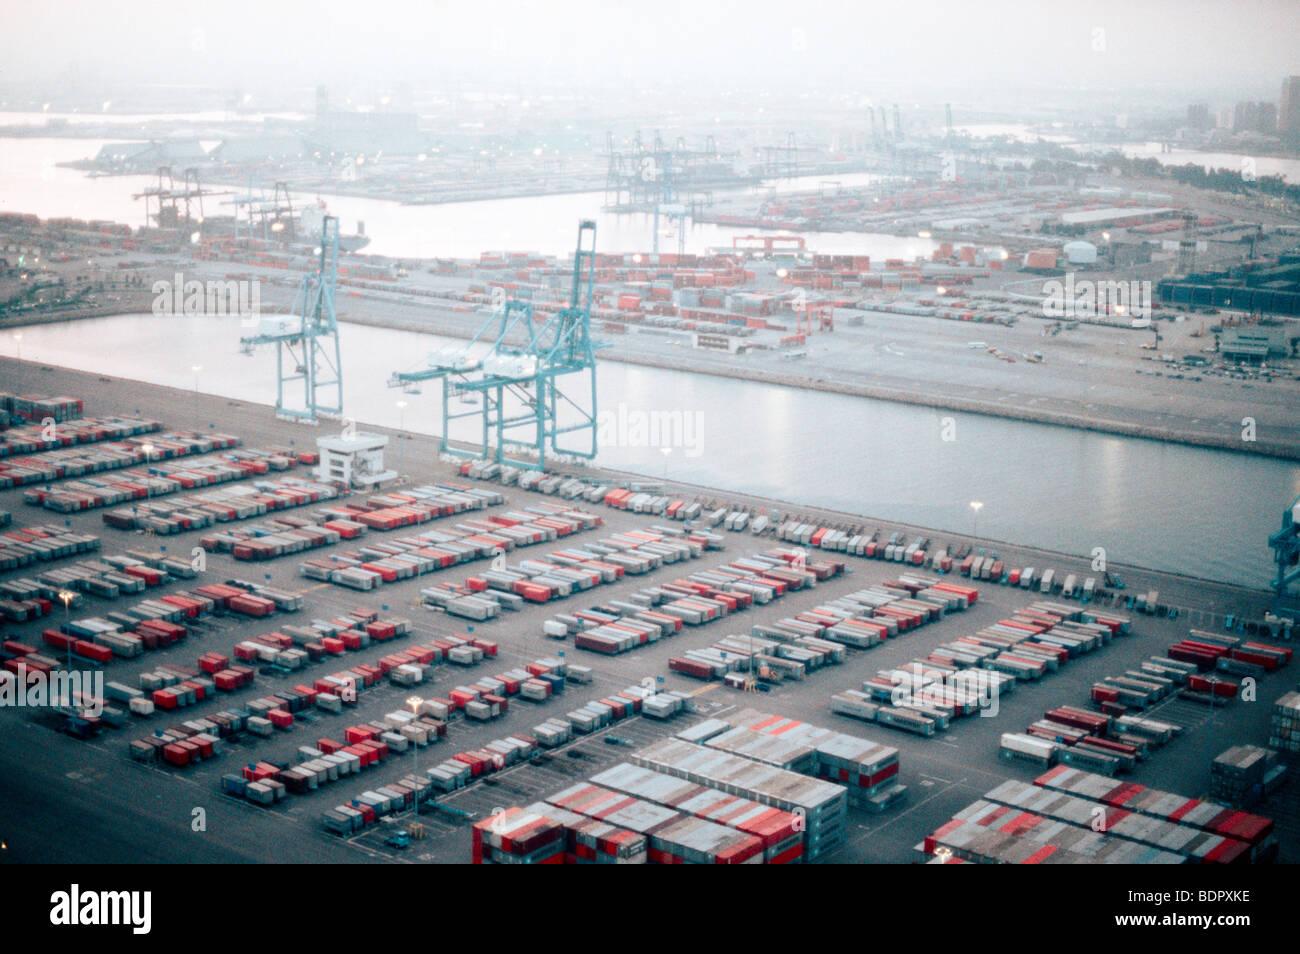 Port of Long Beach - Stock Image